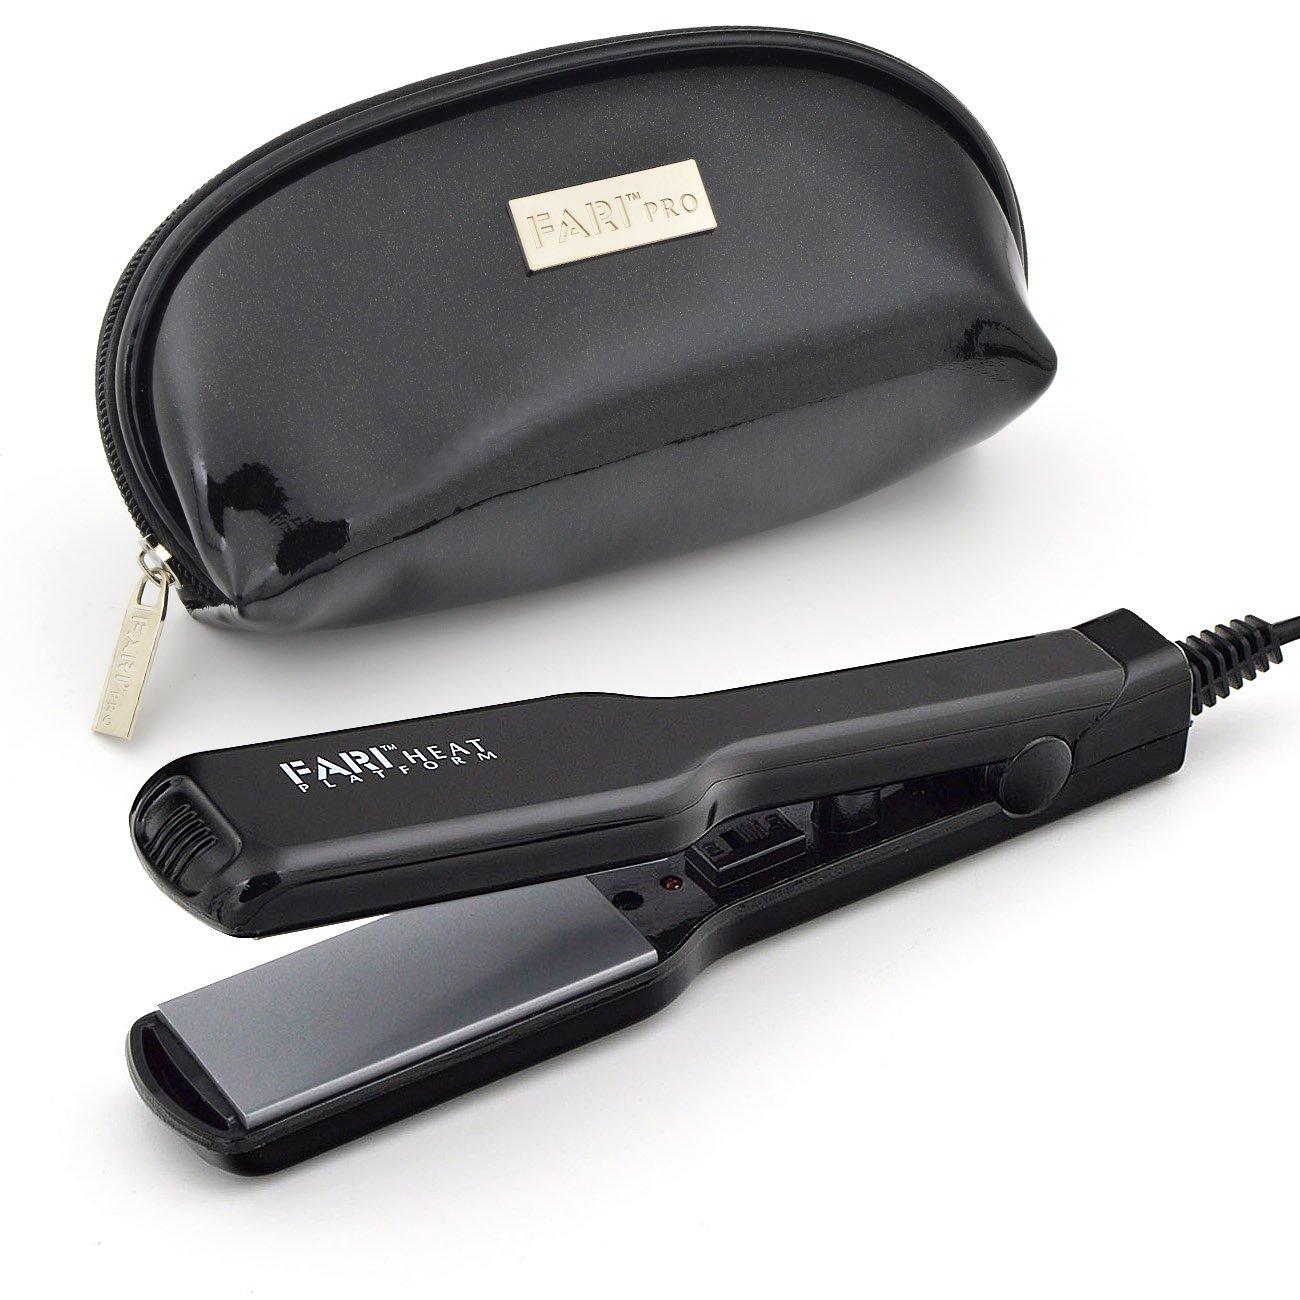 FARIHEAT Travel Mini Hair Flat Iron, Dual Voltage 1 Inch Ceramic Tourmaline Hair Straightener with Travel Pouch (Black)